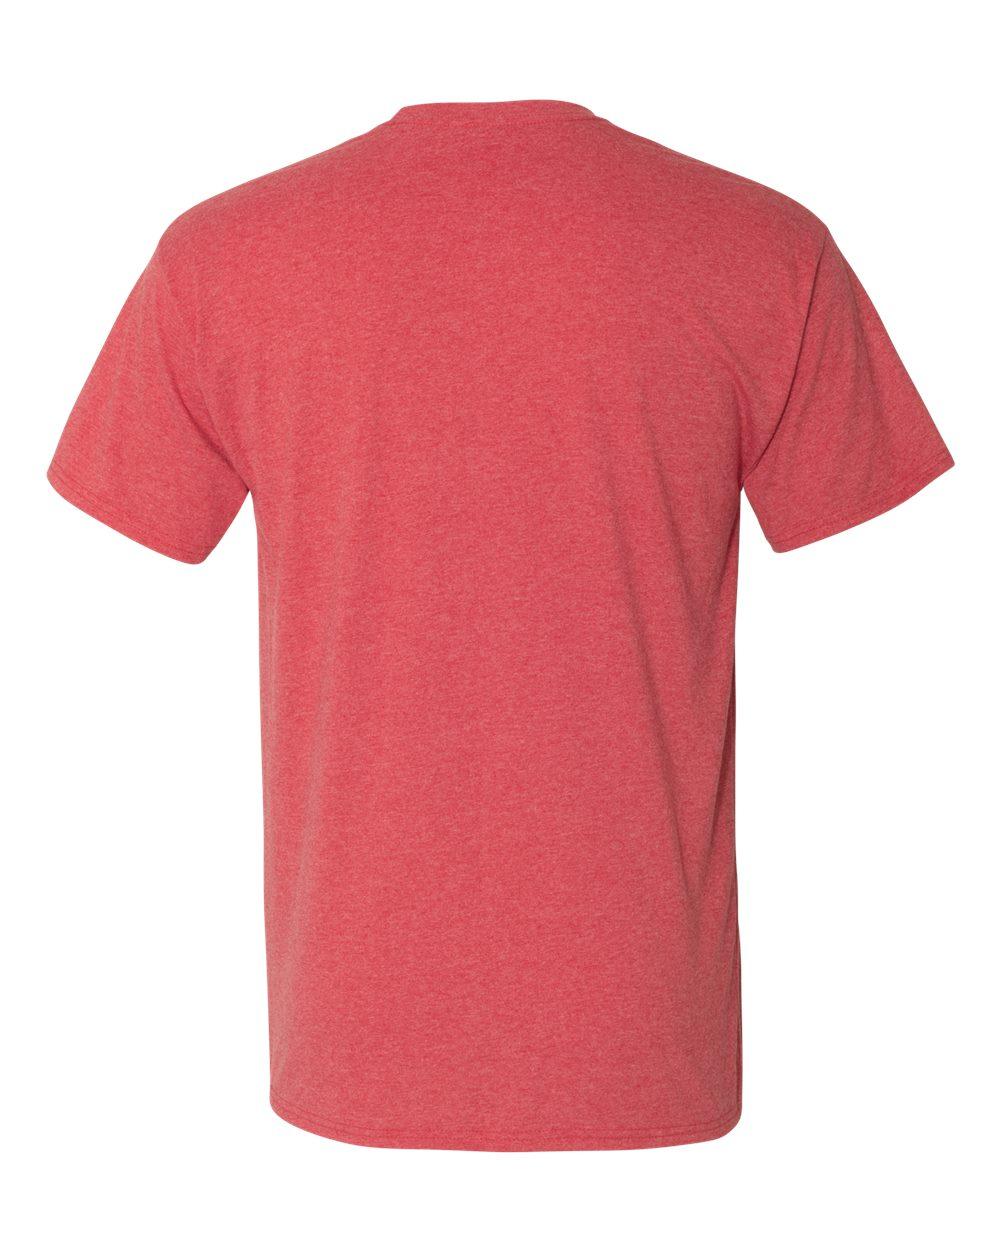 Hanes-Men-039-s-X-Temp-Triblend-T-Shirt-With-Fresh-Iq-42TB-S-3XL thumbnail 11